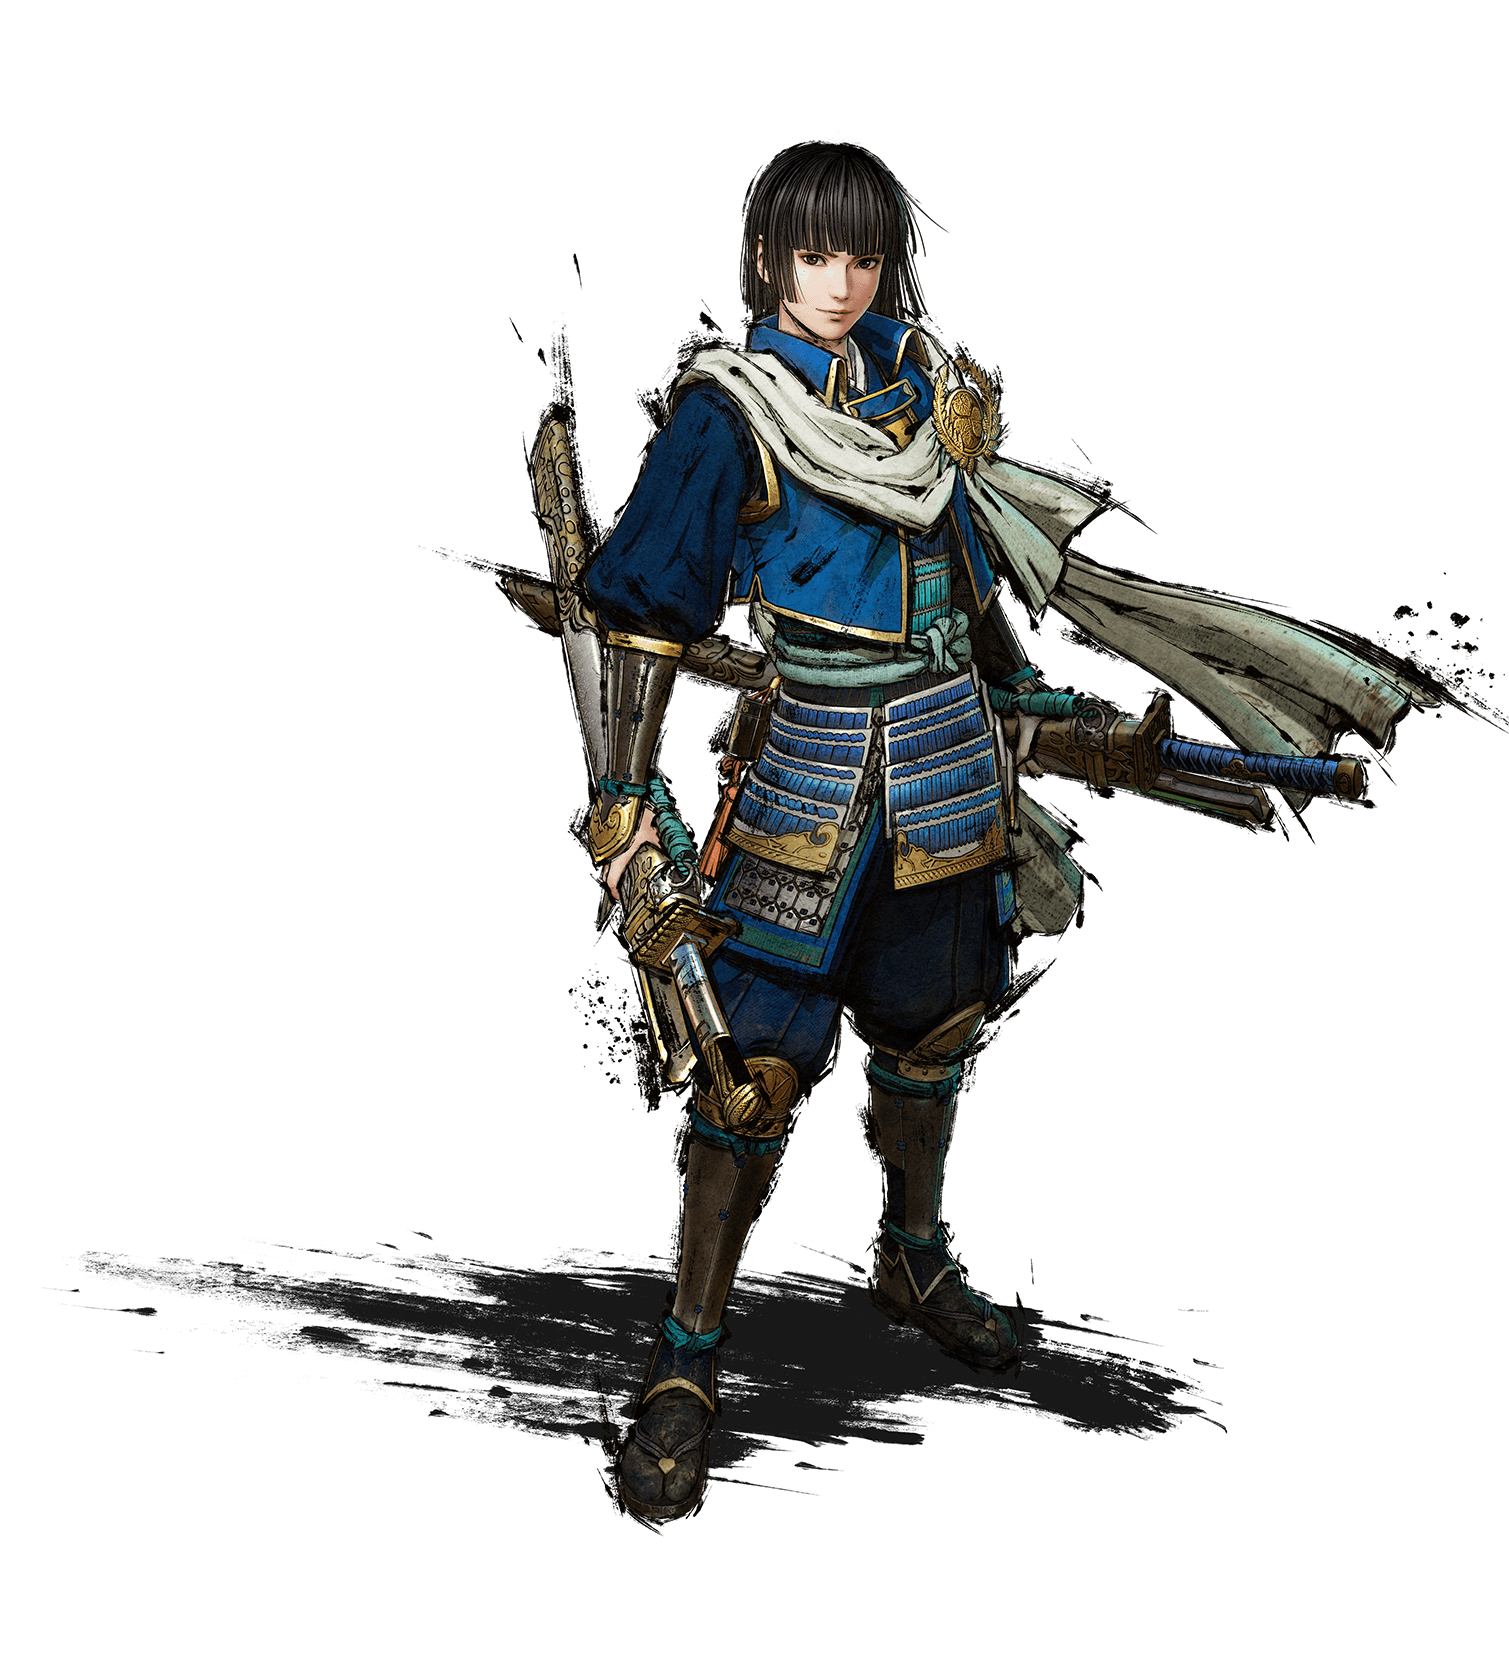 https://www.gamecity.ne.jp/sengoku5/images/character/character03/character.png